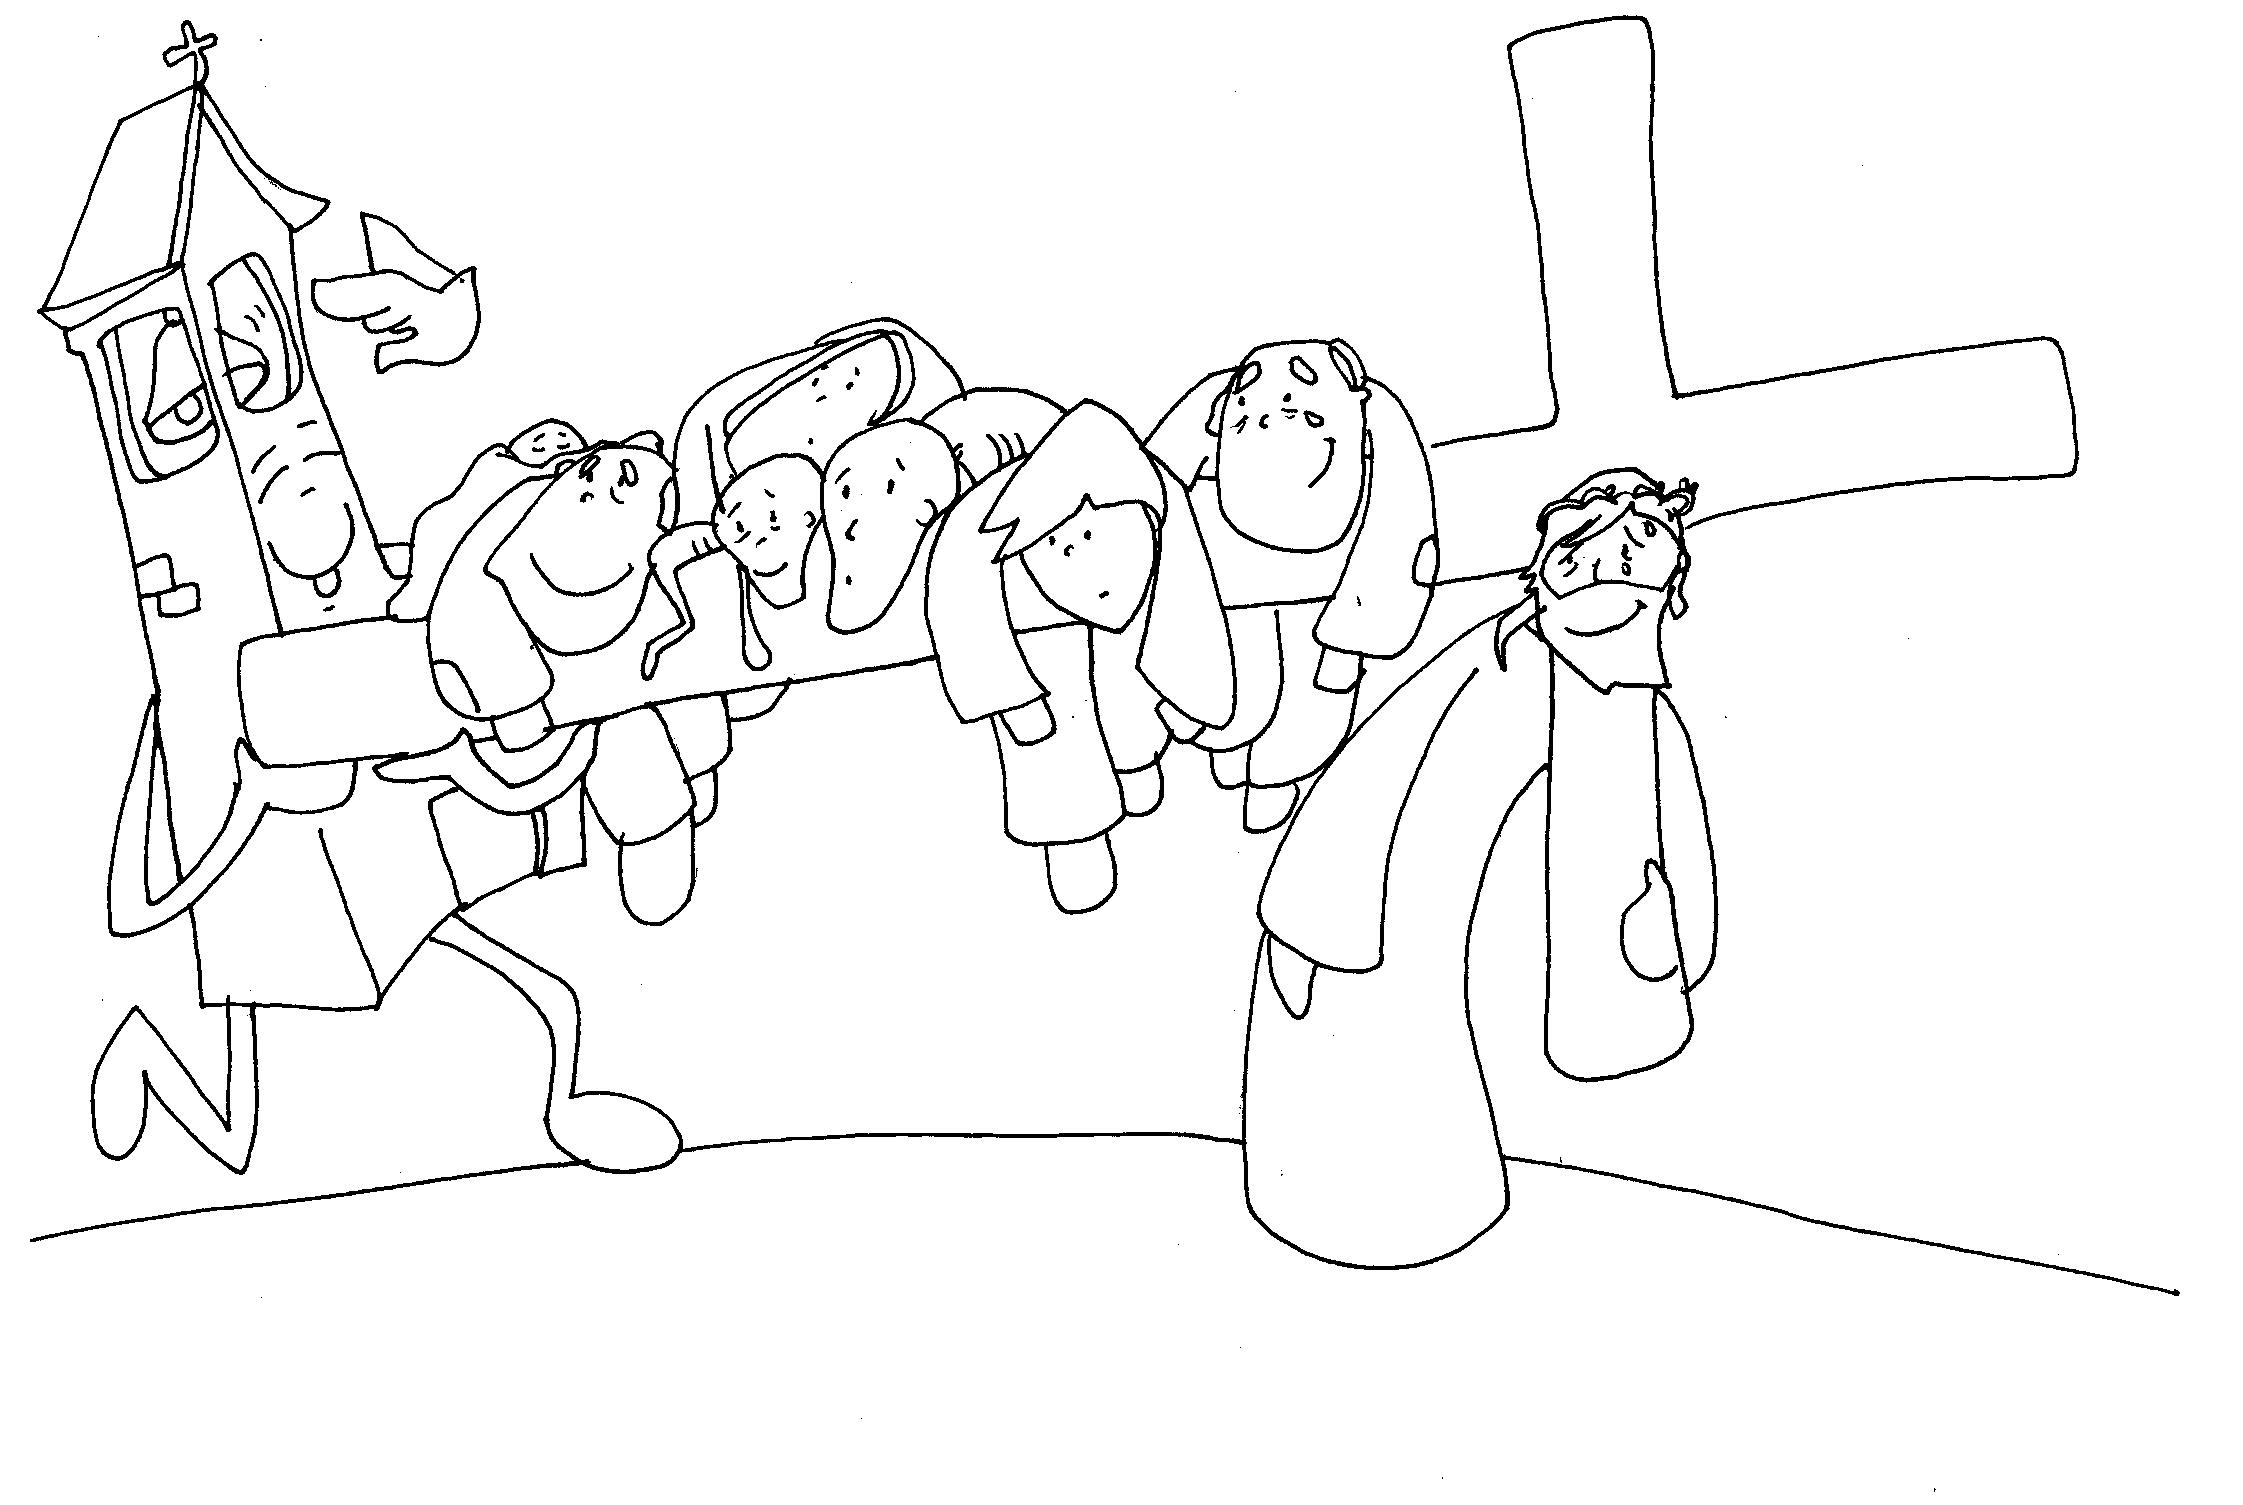 MATERIALES DE RELIGIÓN CATÓLICA: Vía Crucis de Fano para colorear (B/N)